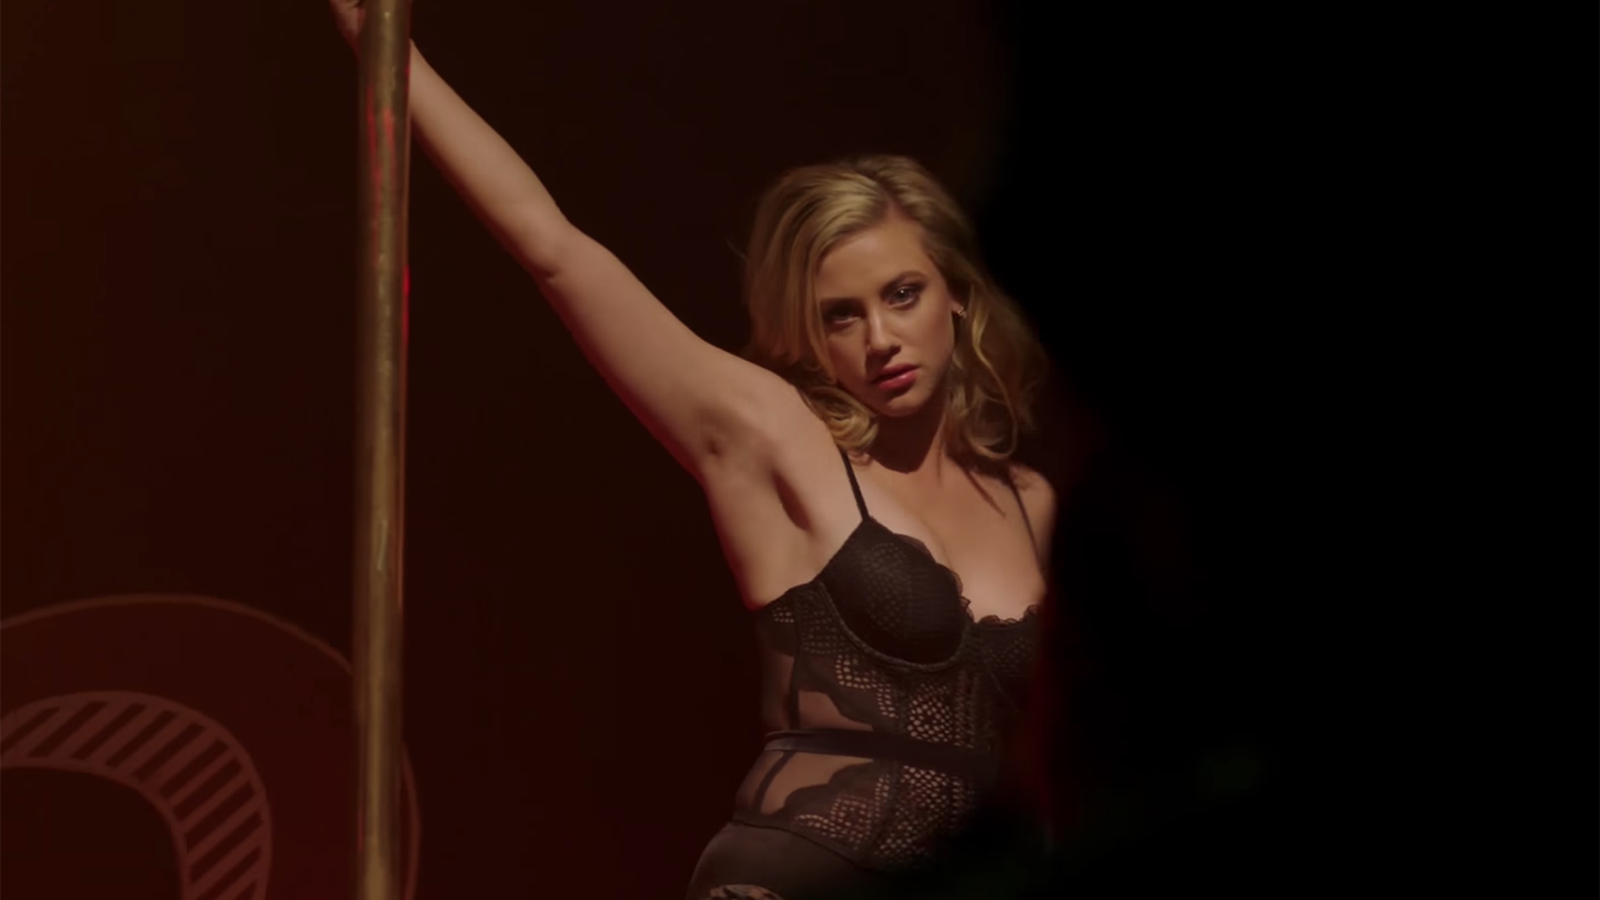 Betty strip dancing